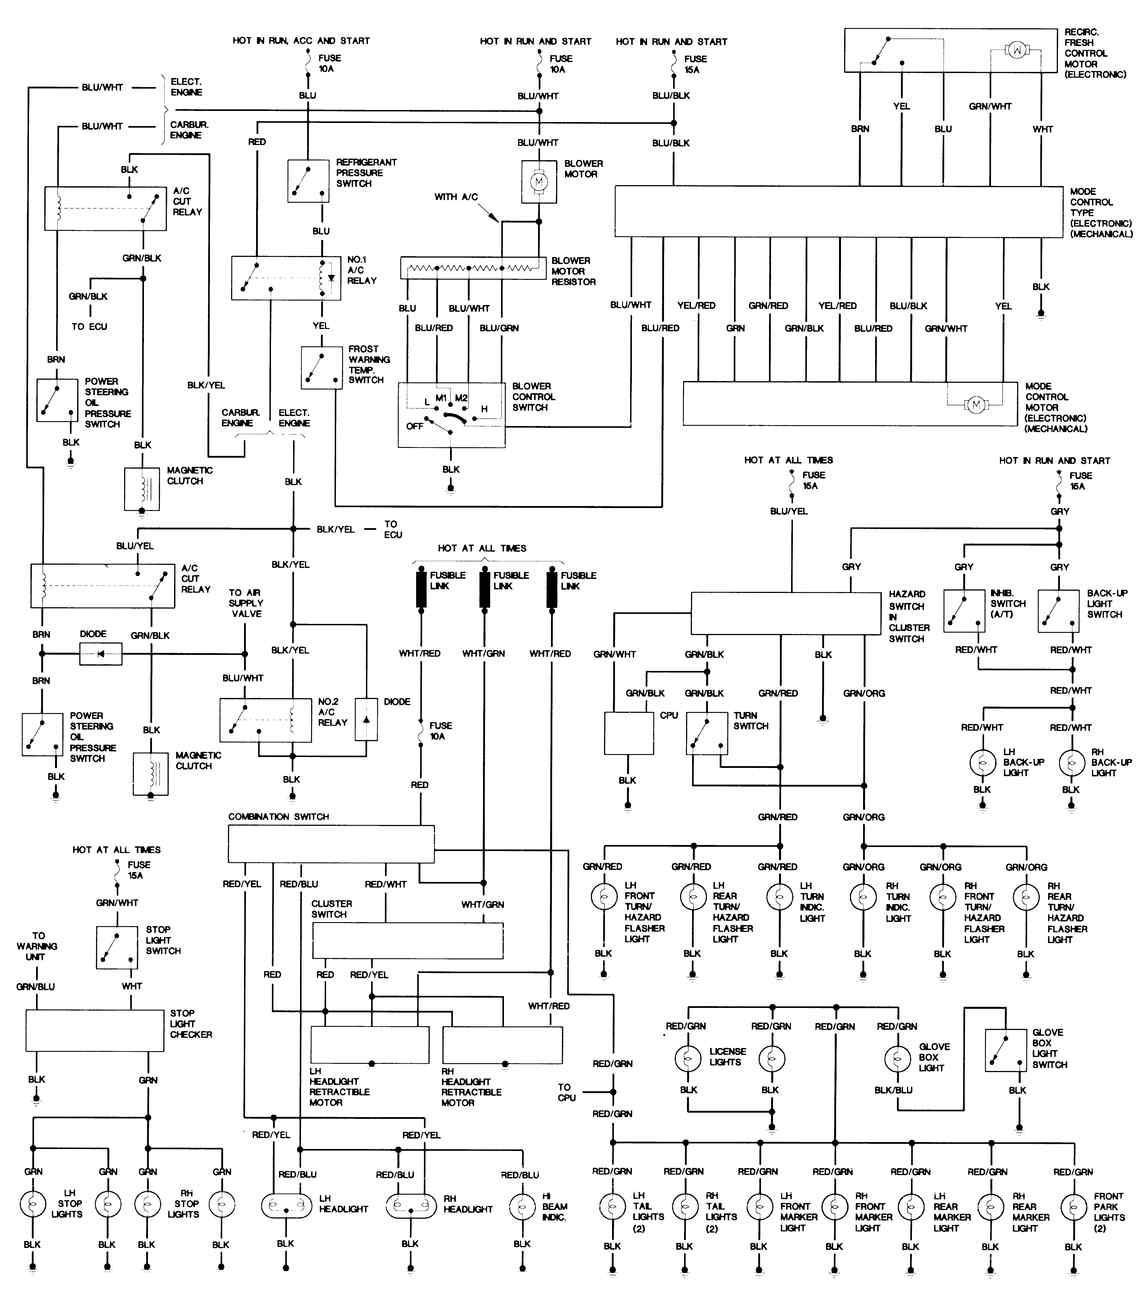 Rx wiring diagram printable wiring diagram database 1984 mazda rx7 wiring 1984 home wiring diagrams source